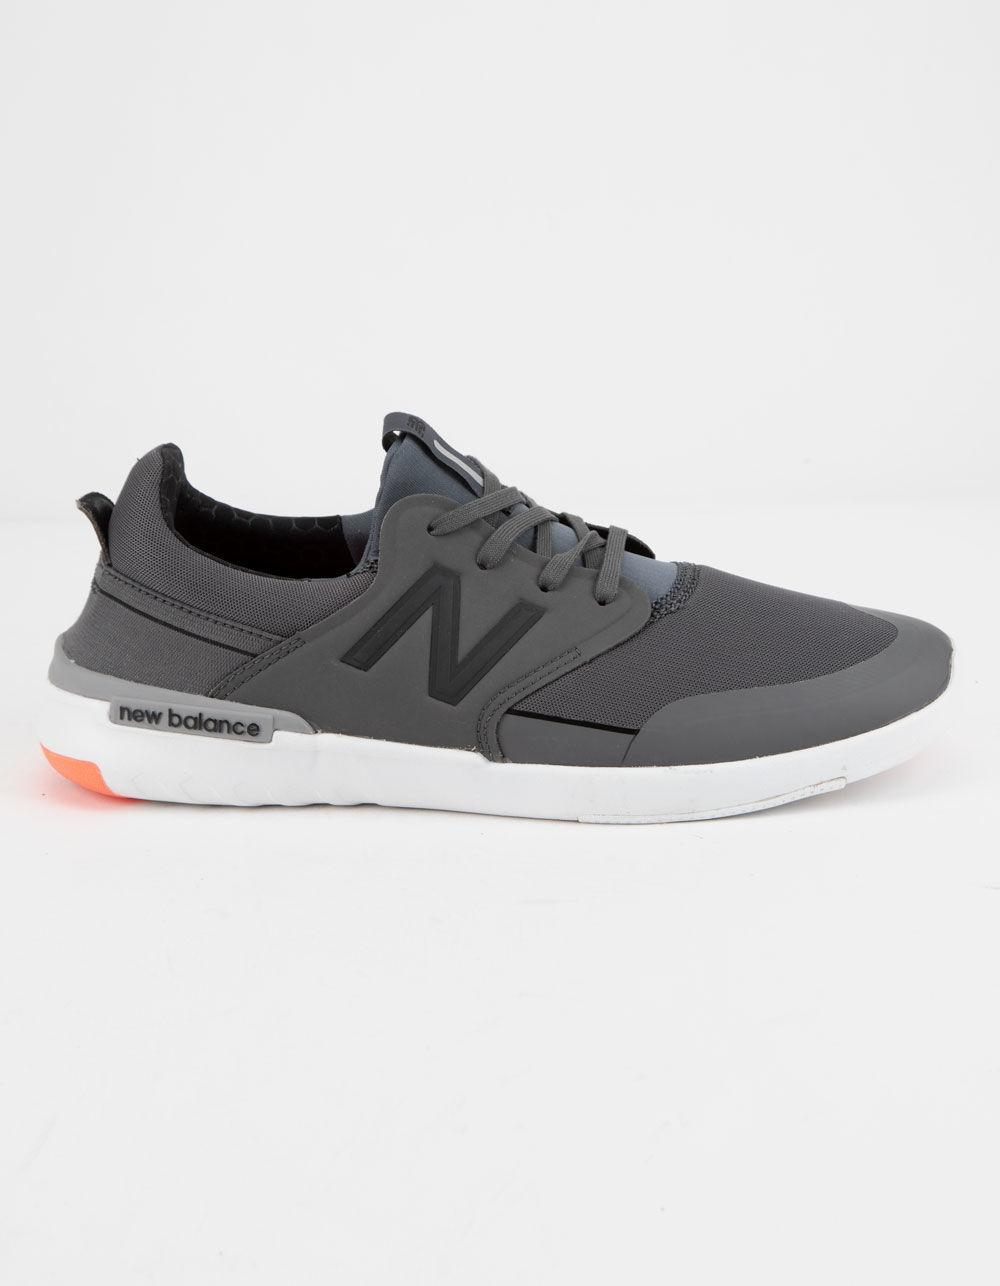 hot sale online 256a5 95eaf New Balance - Gray Am659gdr Mens Shoes for Men - Lyst. View fullscreen